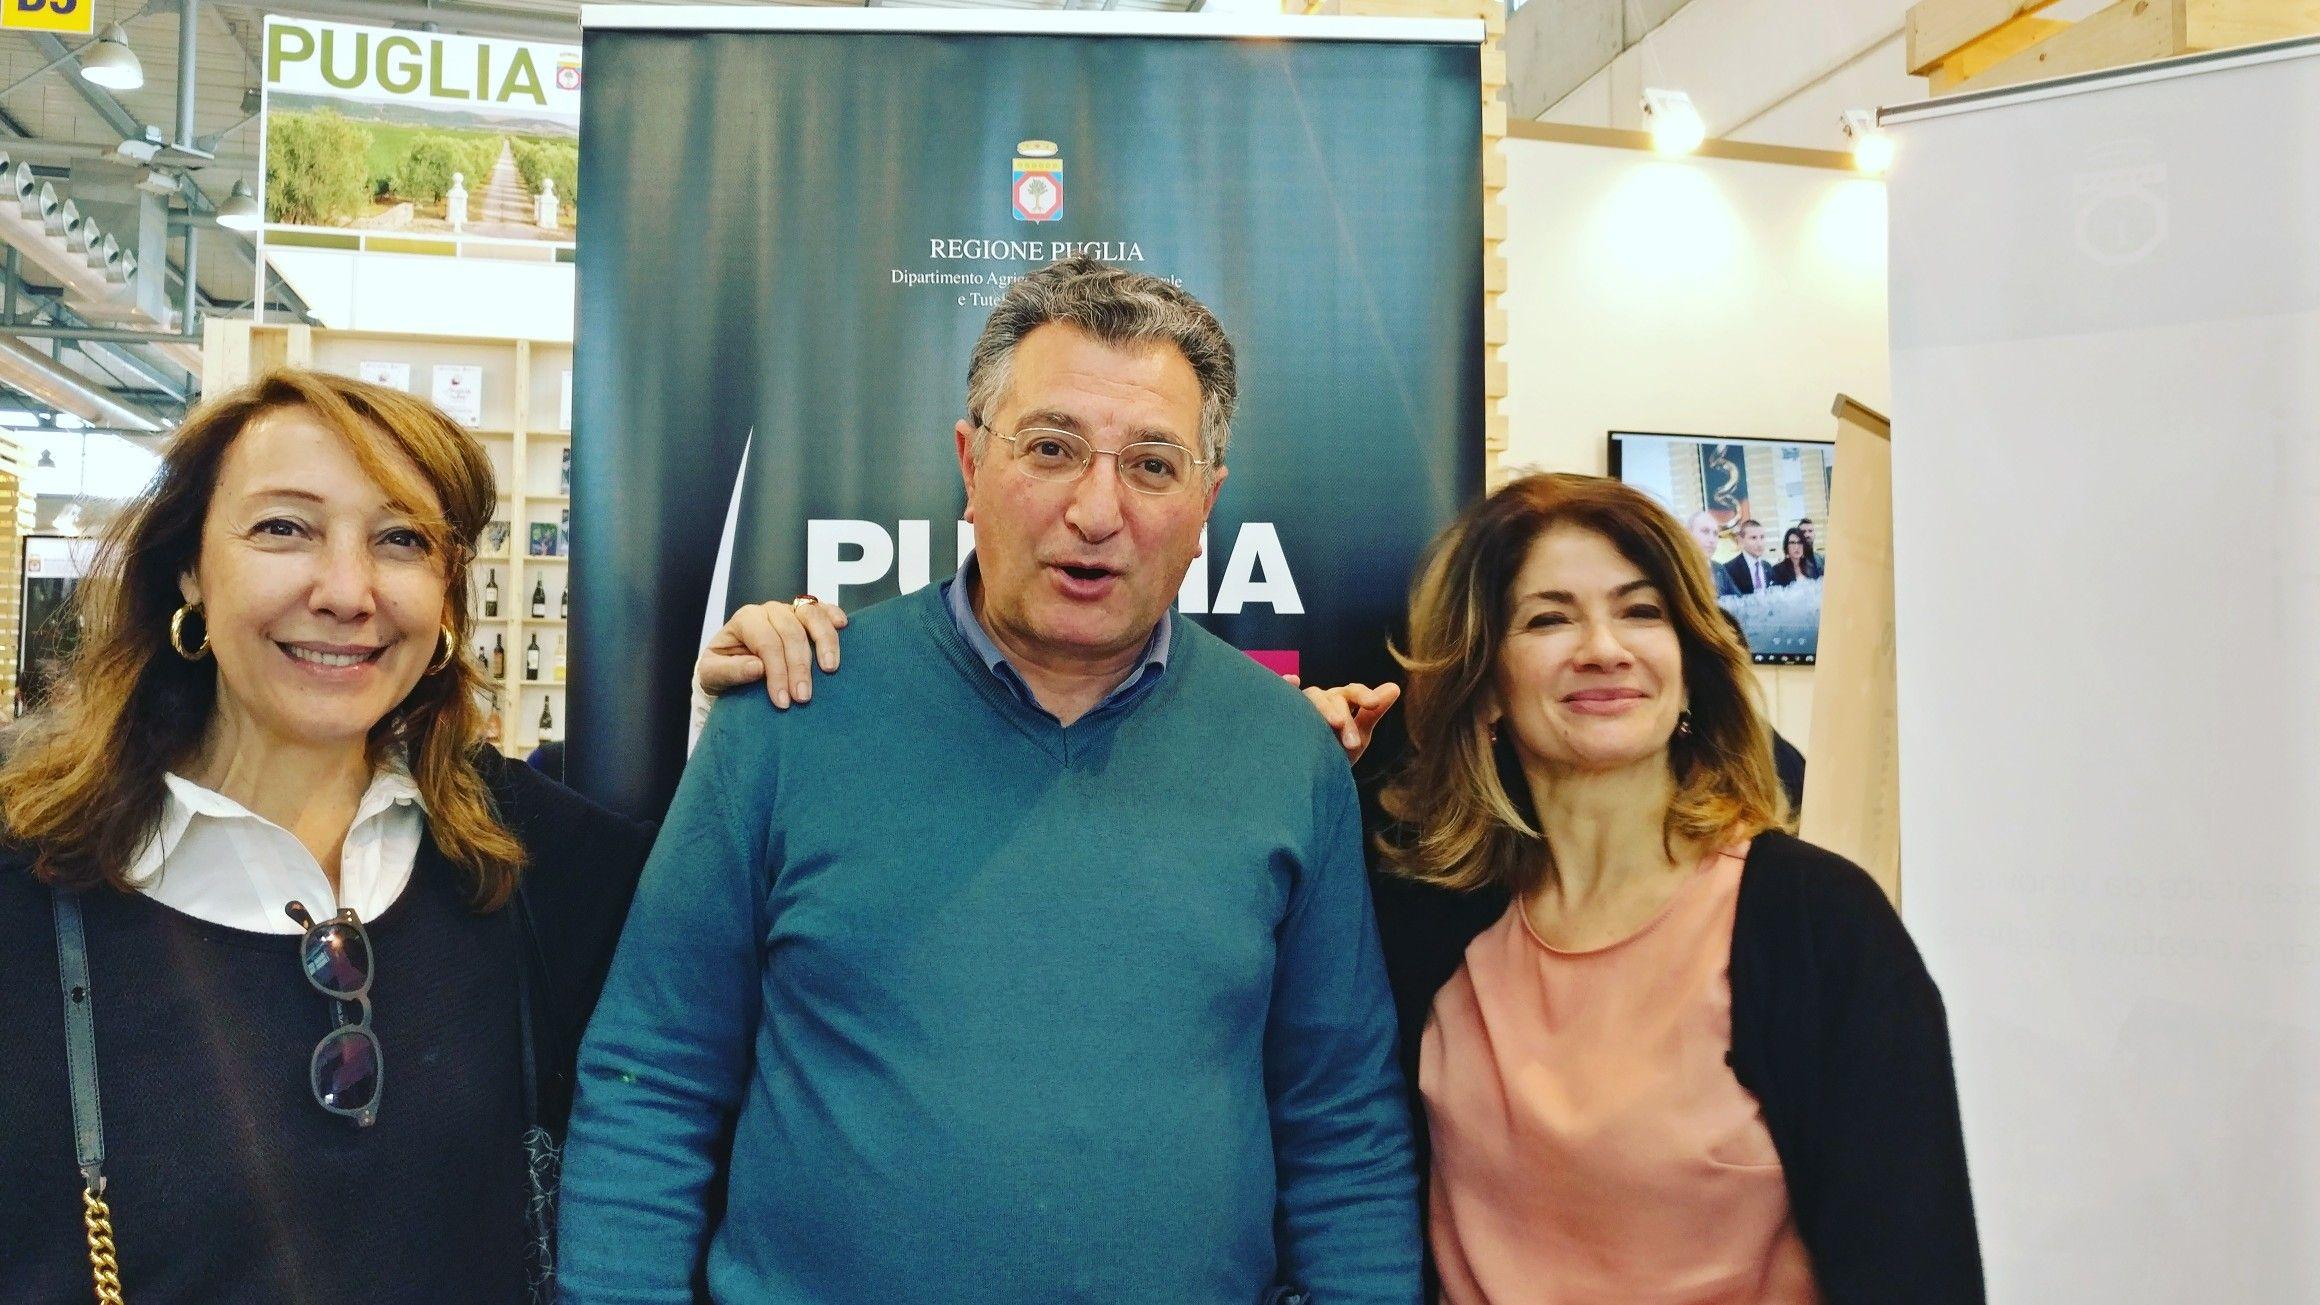 #pugliaworldwine #vinitaly2017 #enjoydarapri asssessorato agricoltura regione #puglia #weareinpuglia #kibriteCalce comunicazione